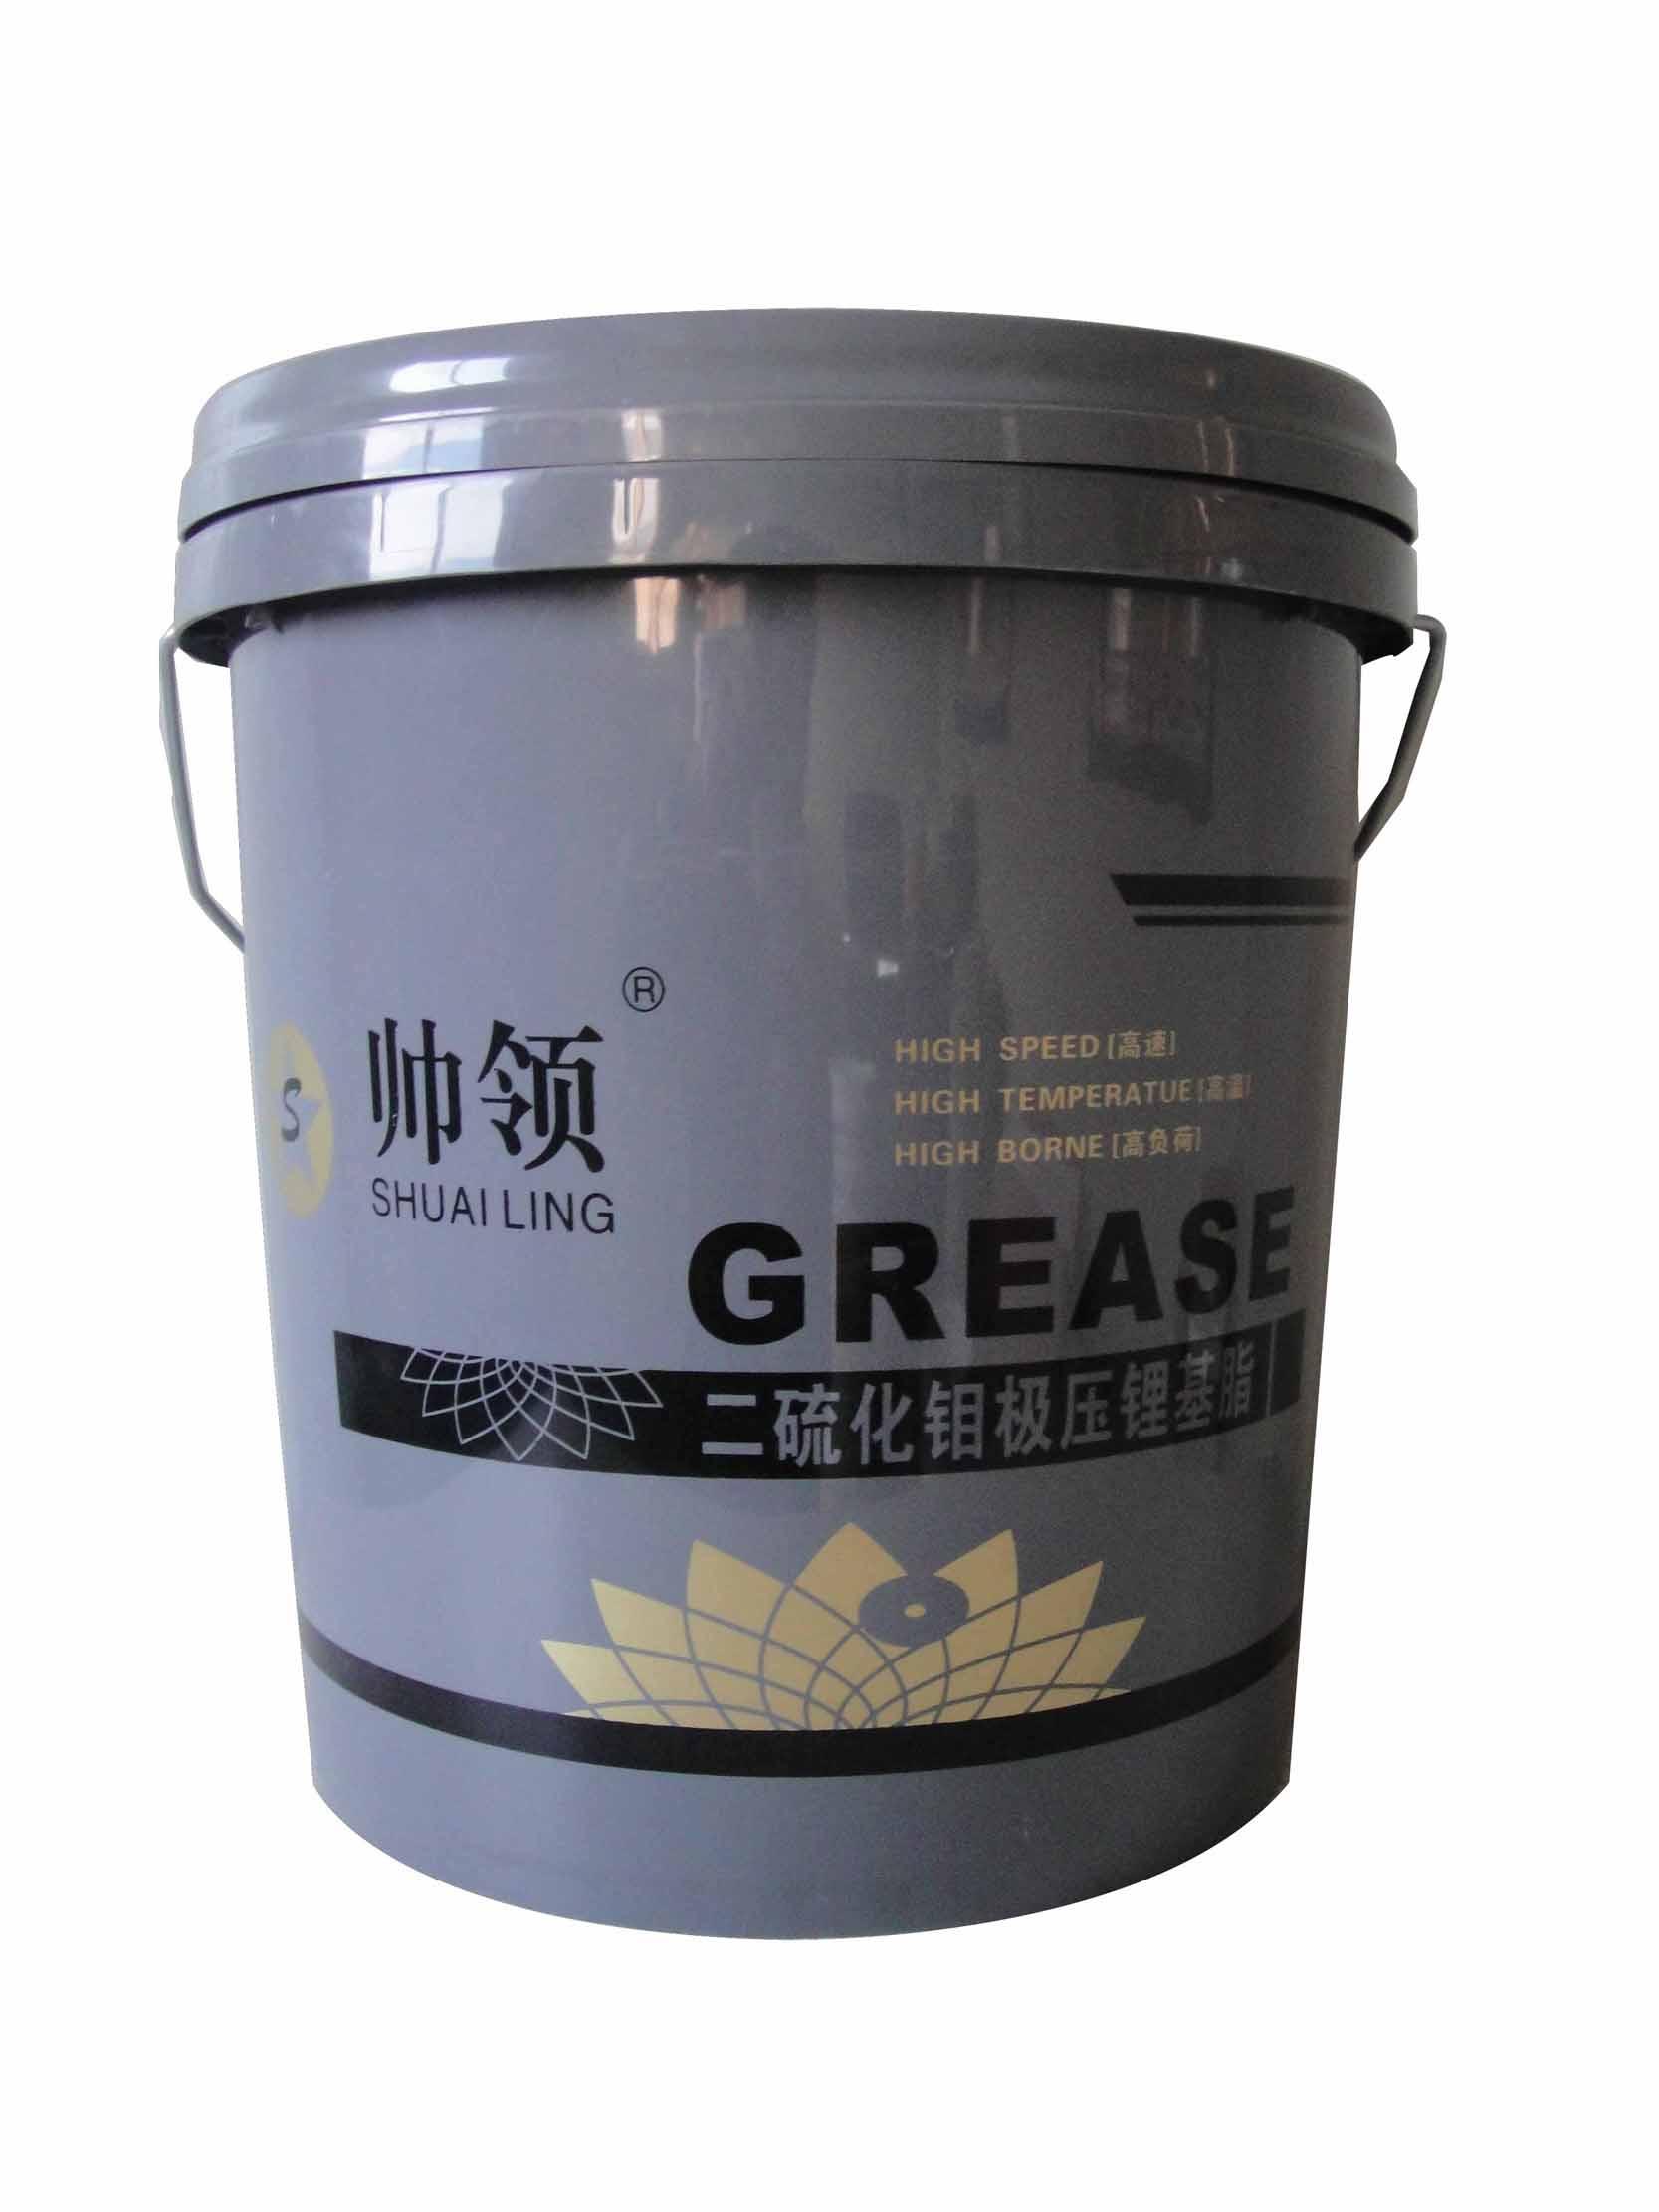 Molybdenum disulfide extreme pressure lithium grease